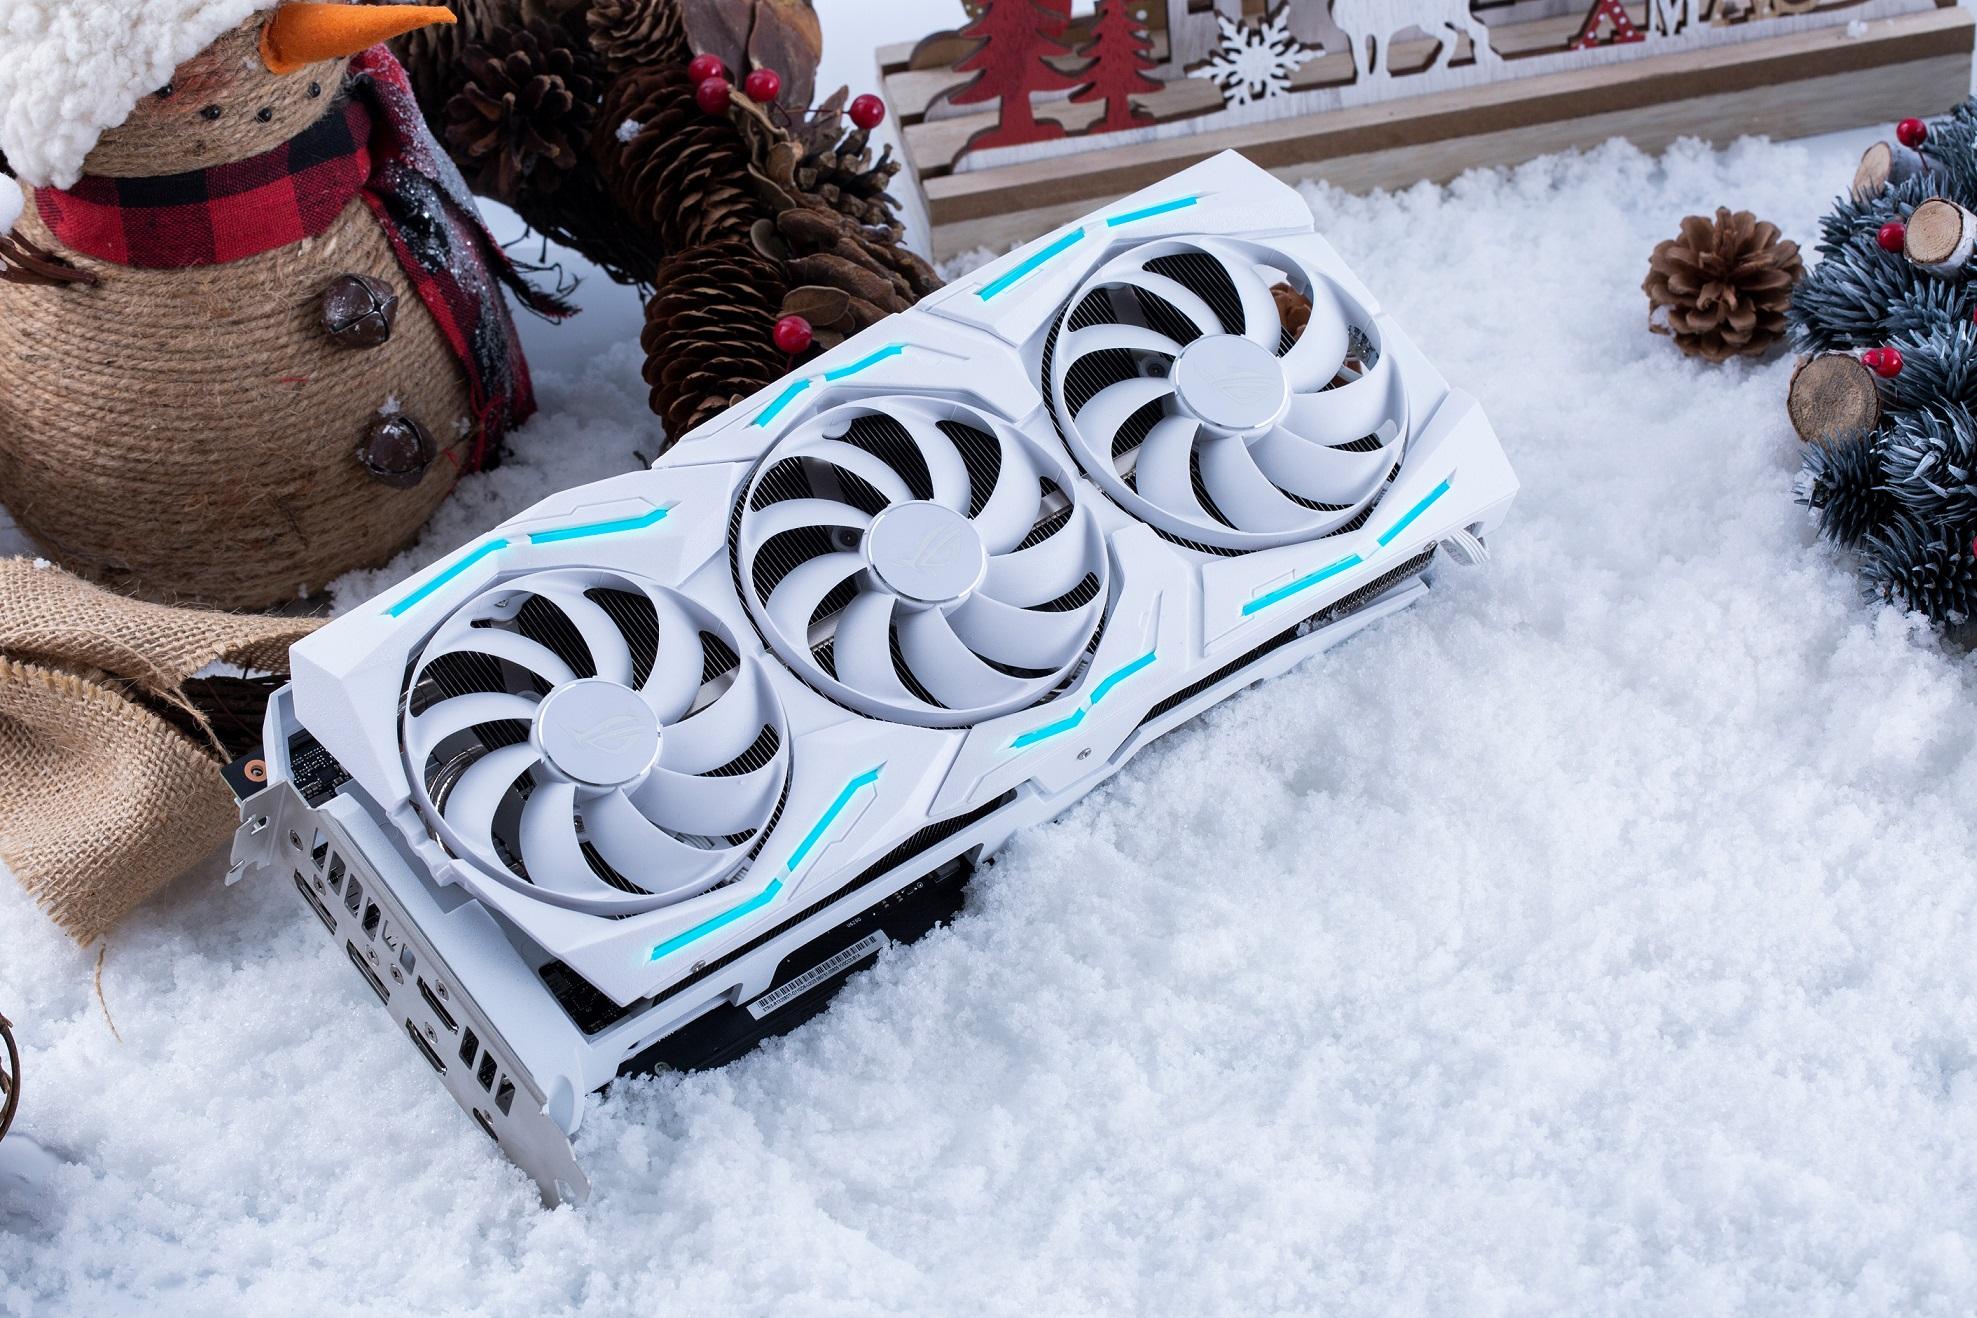 ROG Strix GeForce RTX 2080 Ti潮競白電競顯示卡源自白色聖誕為設計靈感,即刻為白色聖誕節揭開序幕、增添更多歡樂氛圍。